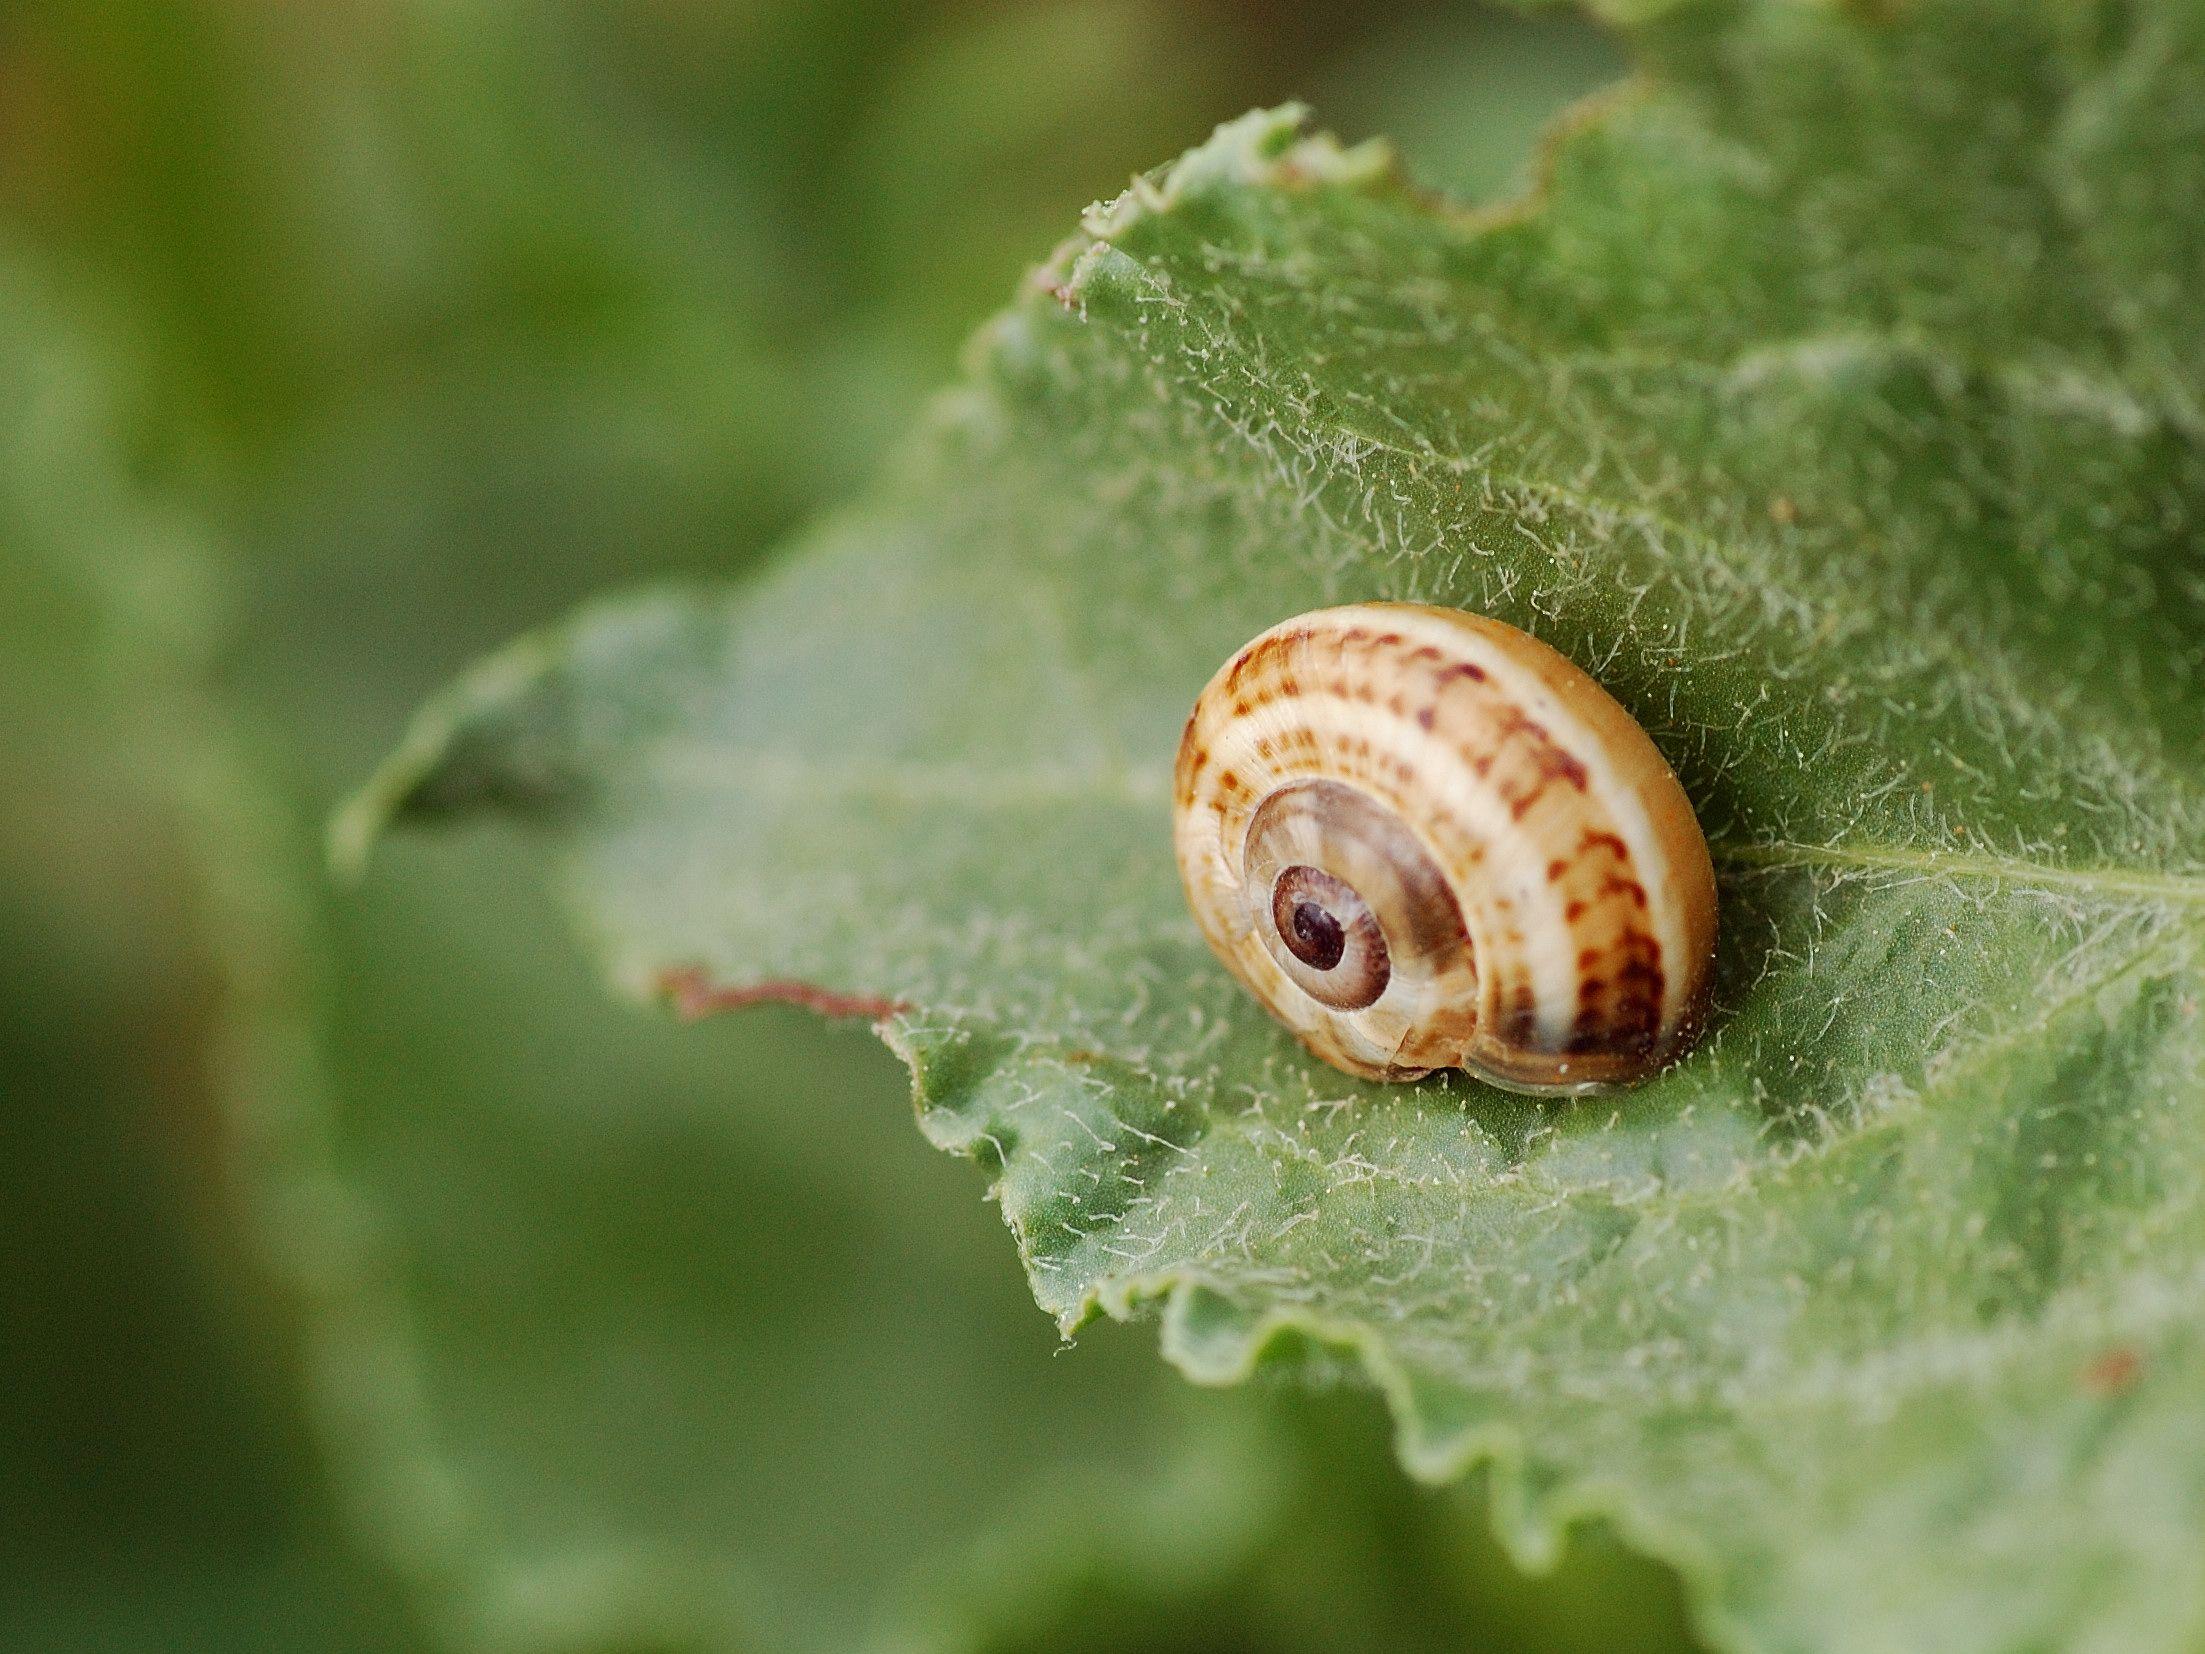 A sleeping snail